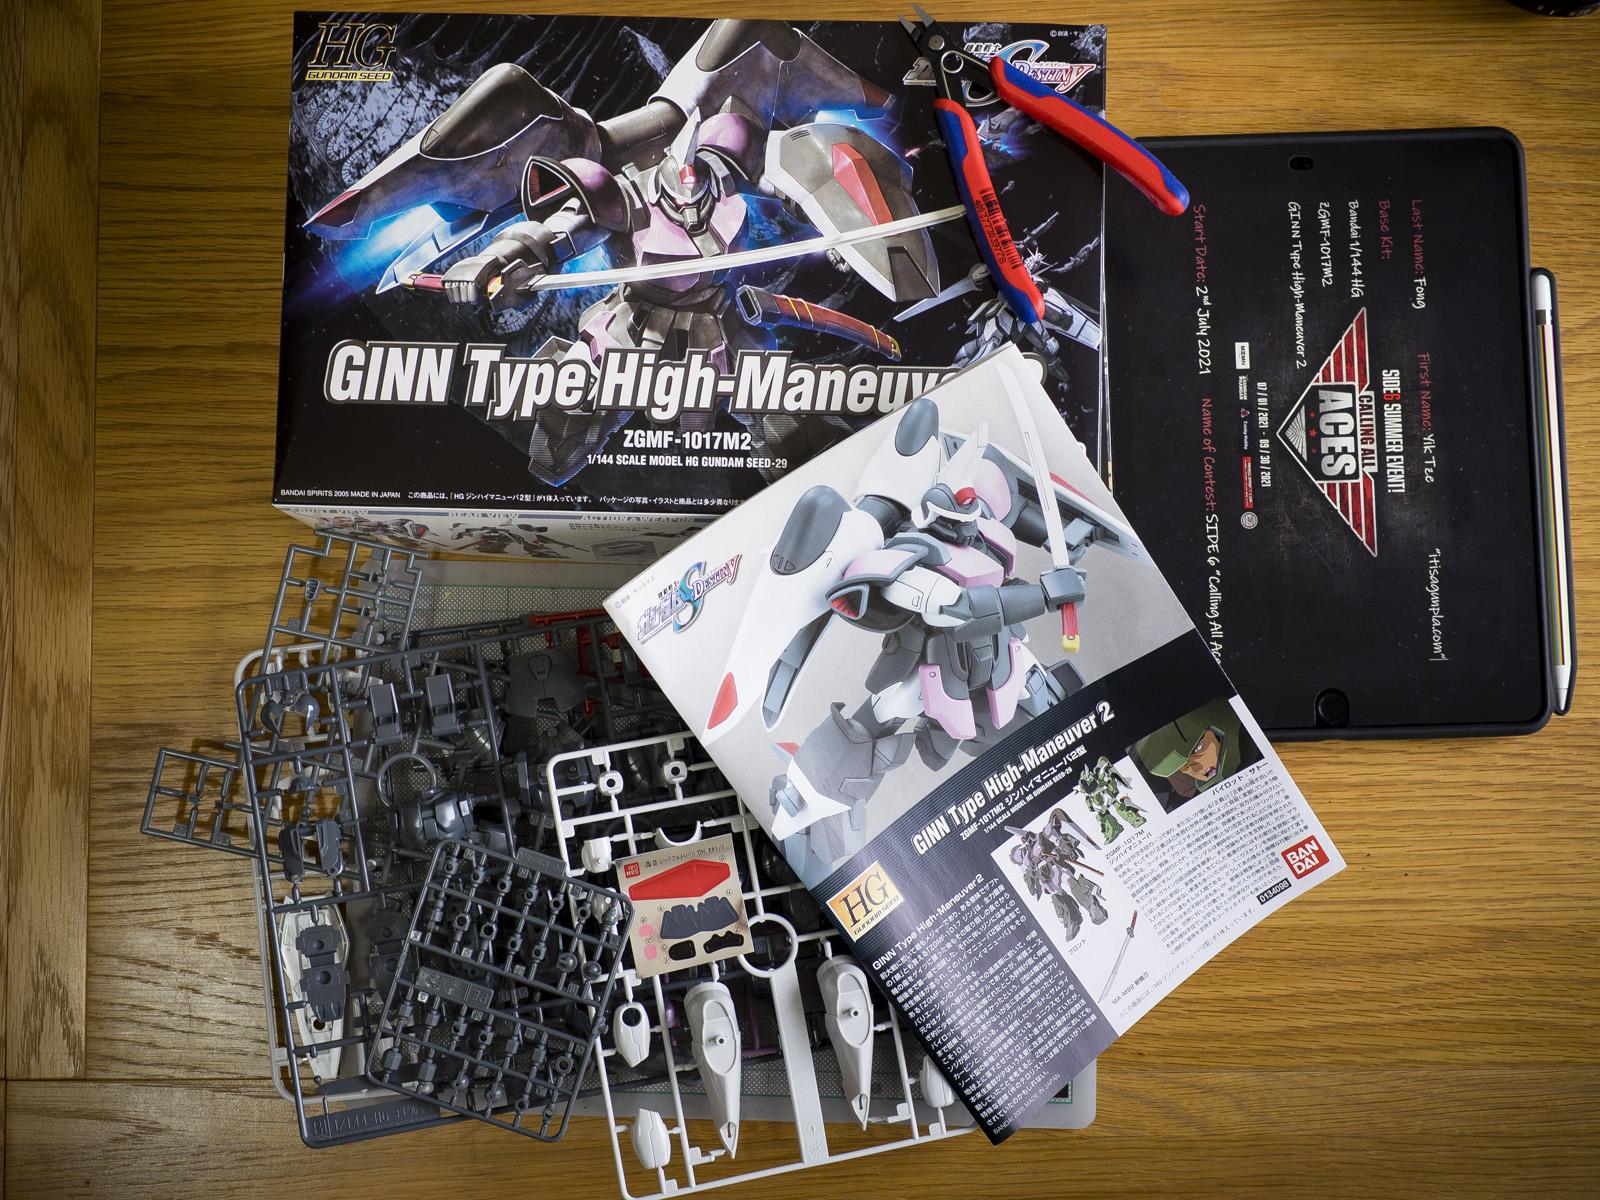 Bandai 1/144 HG ZGMF-1017M2 GINN Type High-Maneuver 2